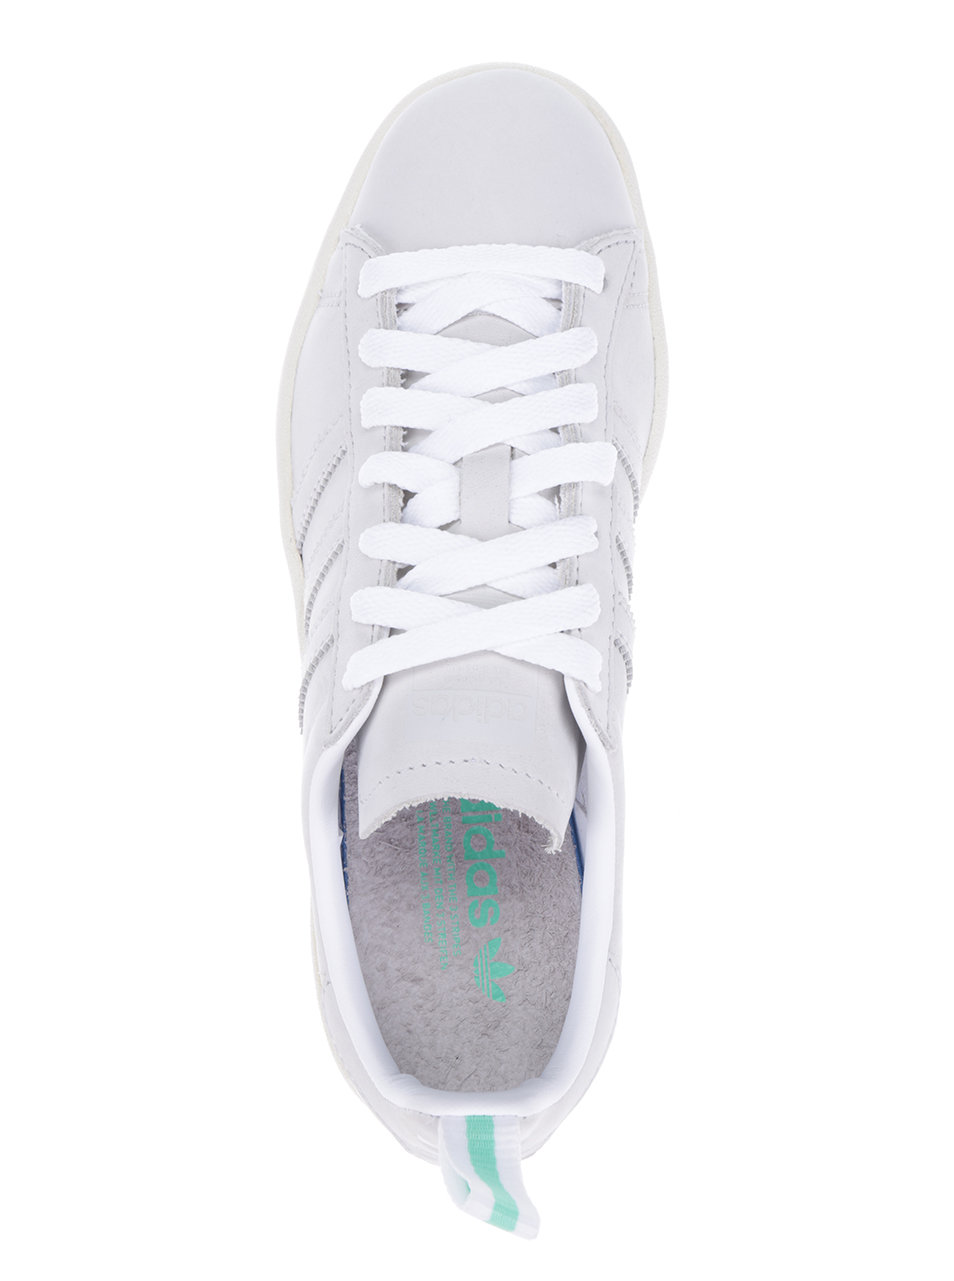 Sivé dámske kožené tenisky adidas Originals Campus ... 014047addd